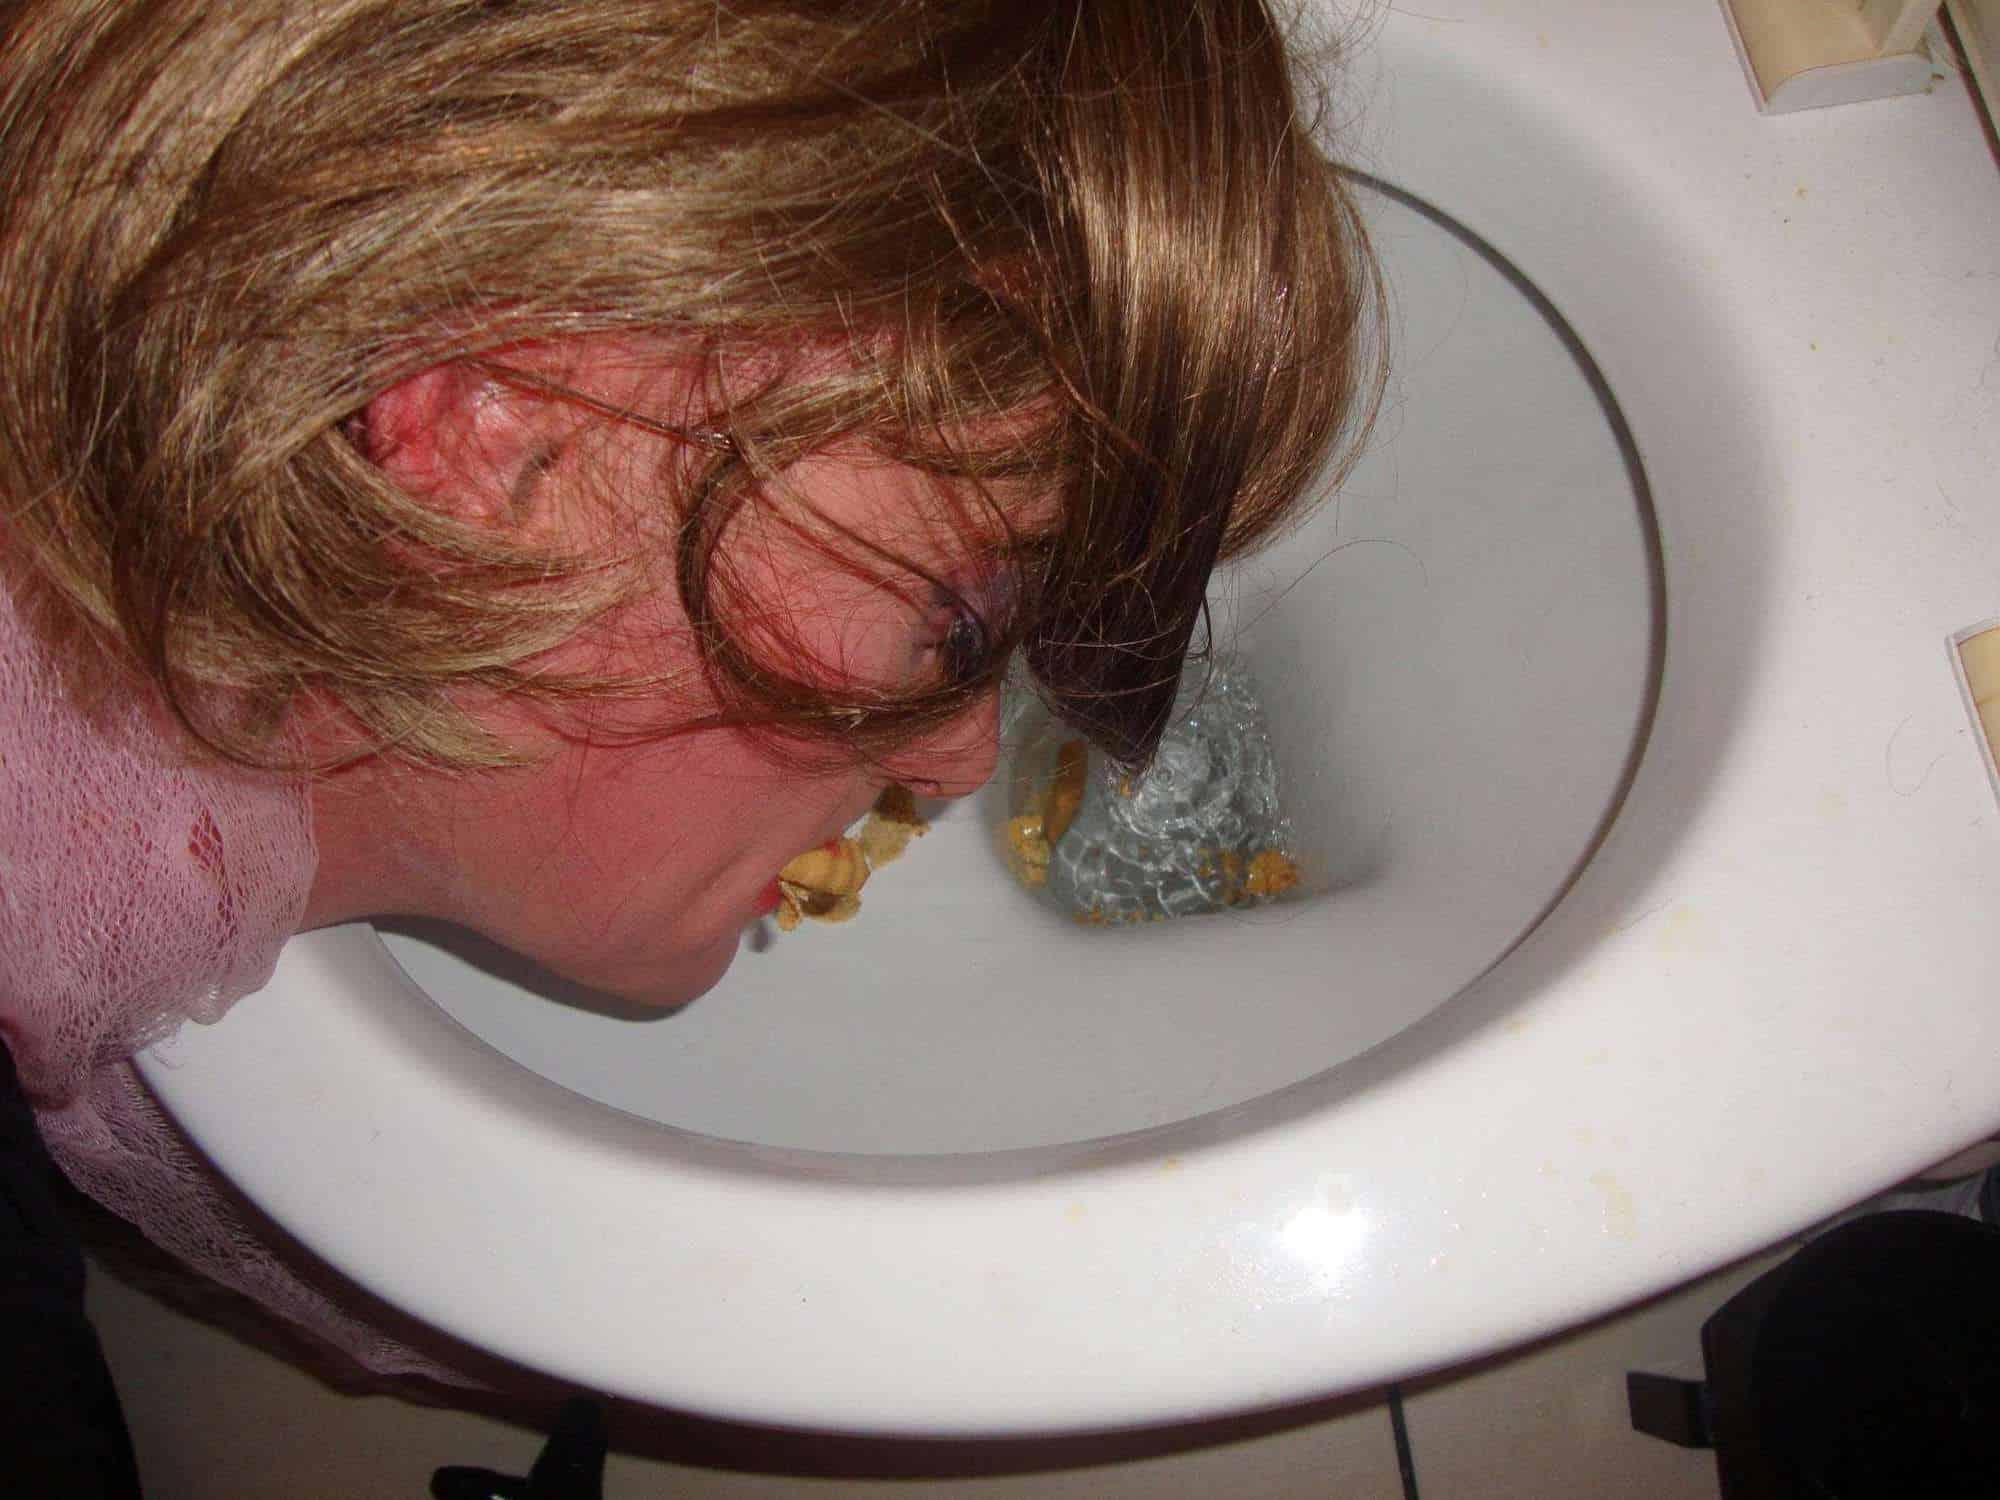 sissy toilet cleaner, sissy humiliated